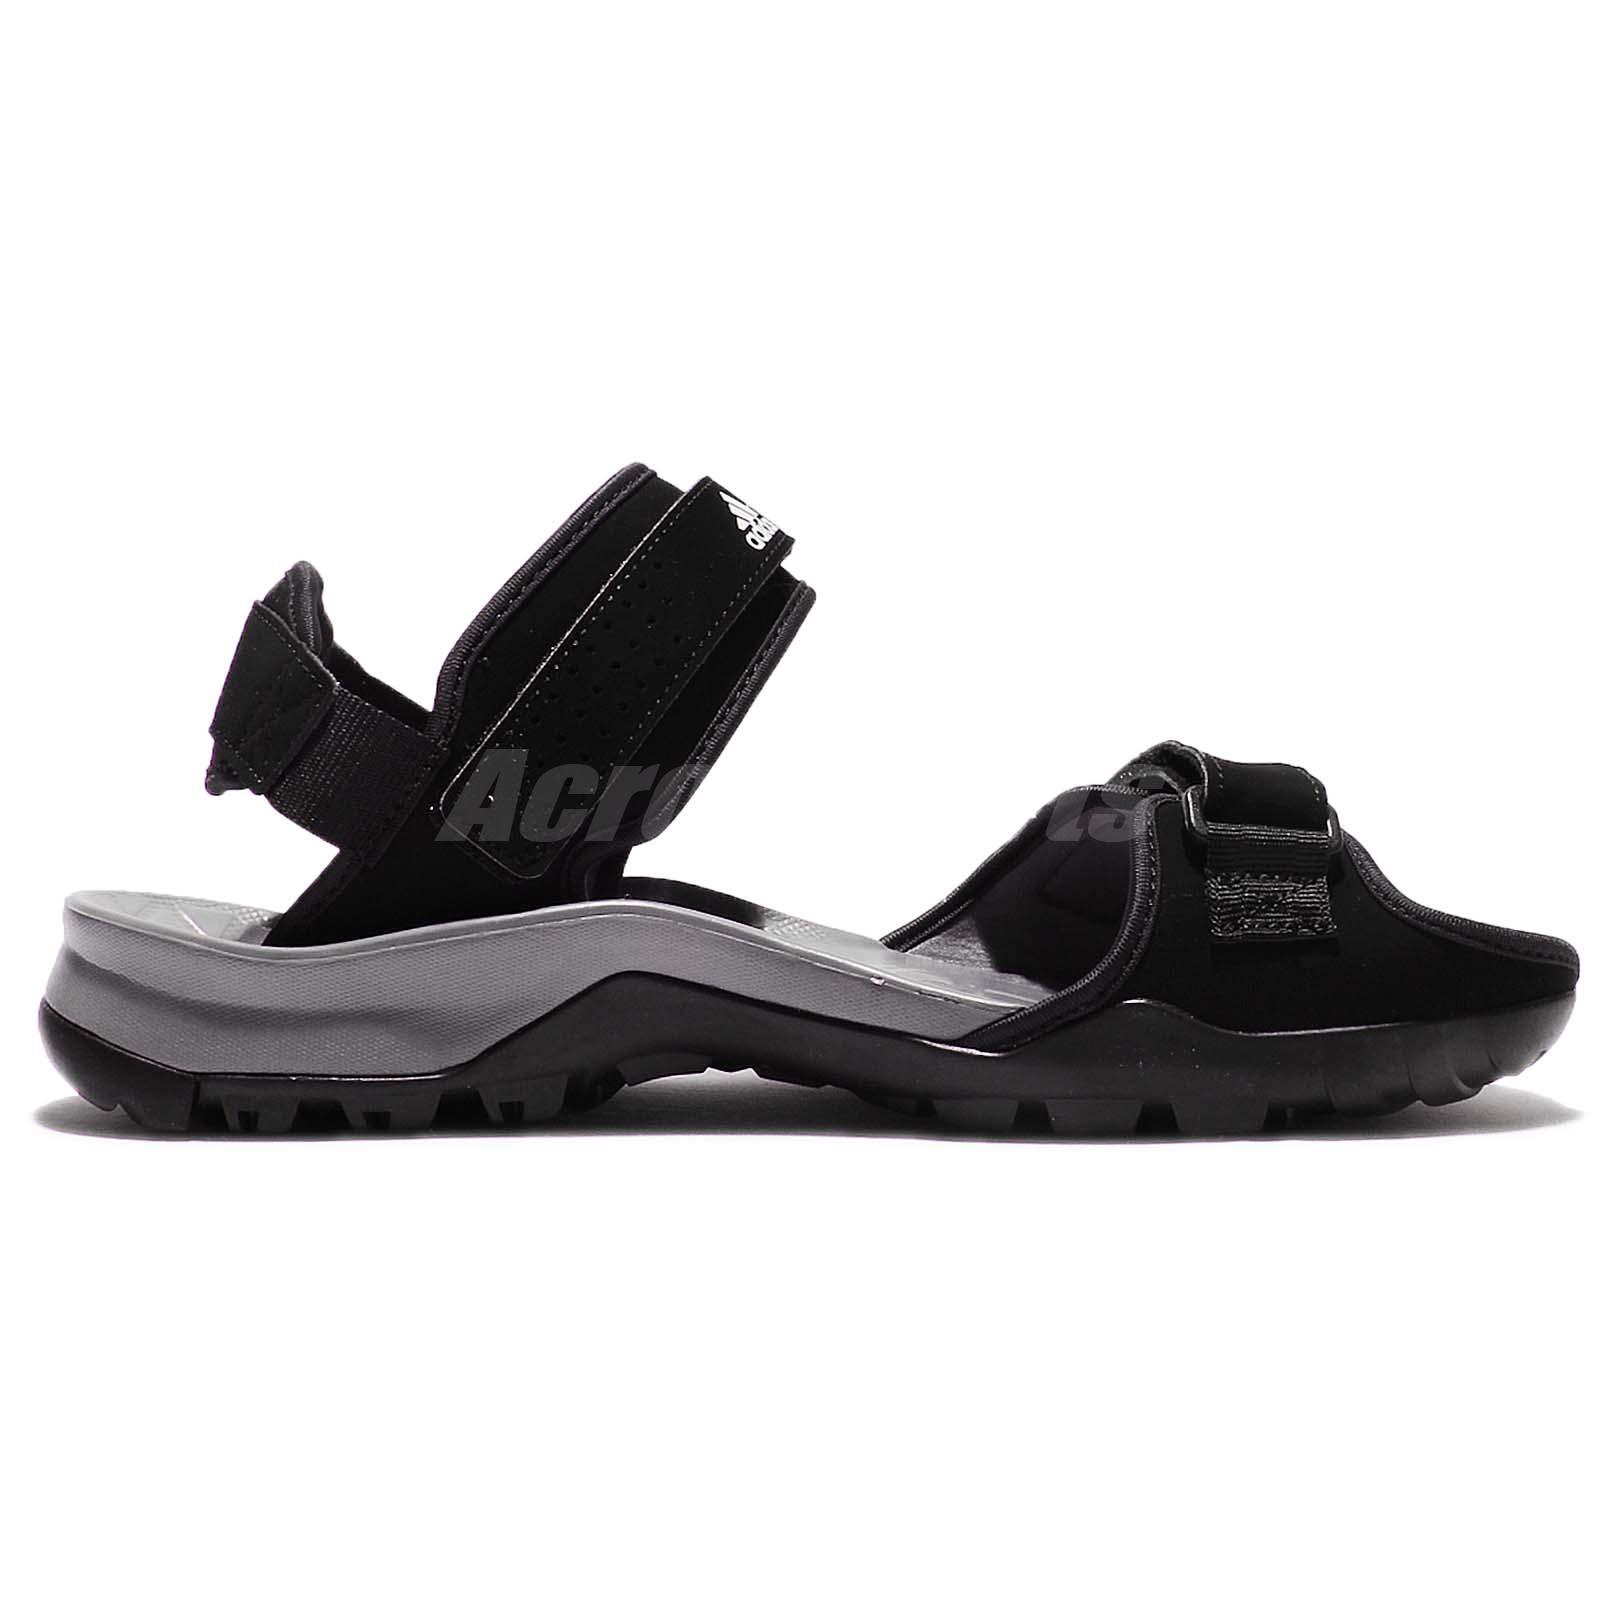 adidas Cyprex Ultra Sandal II 2 Black Grey Men Outdoor Hiking ... 60bbbb21d